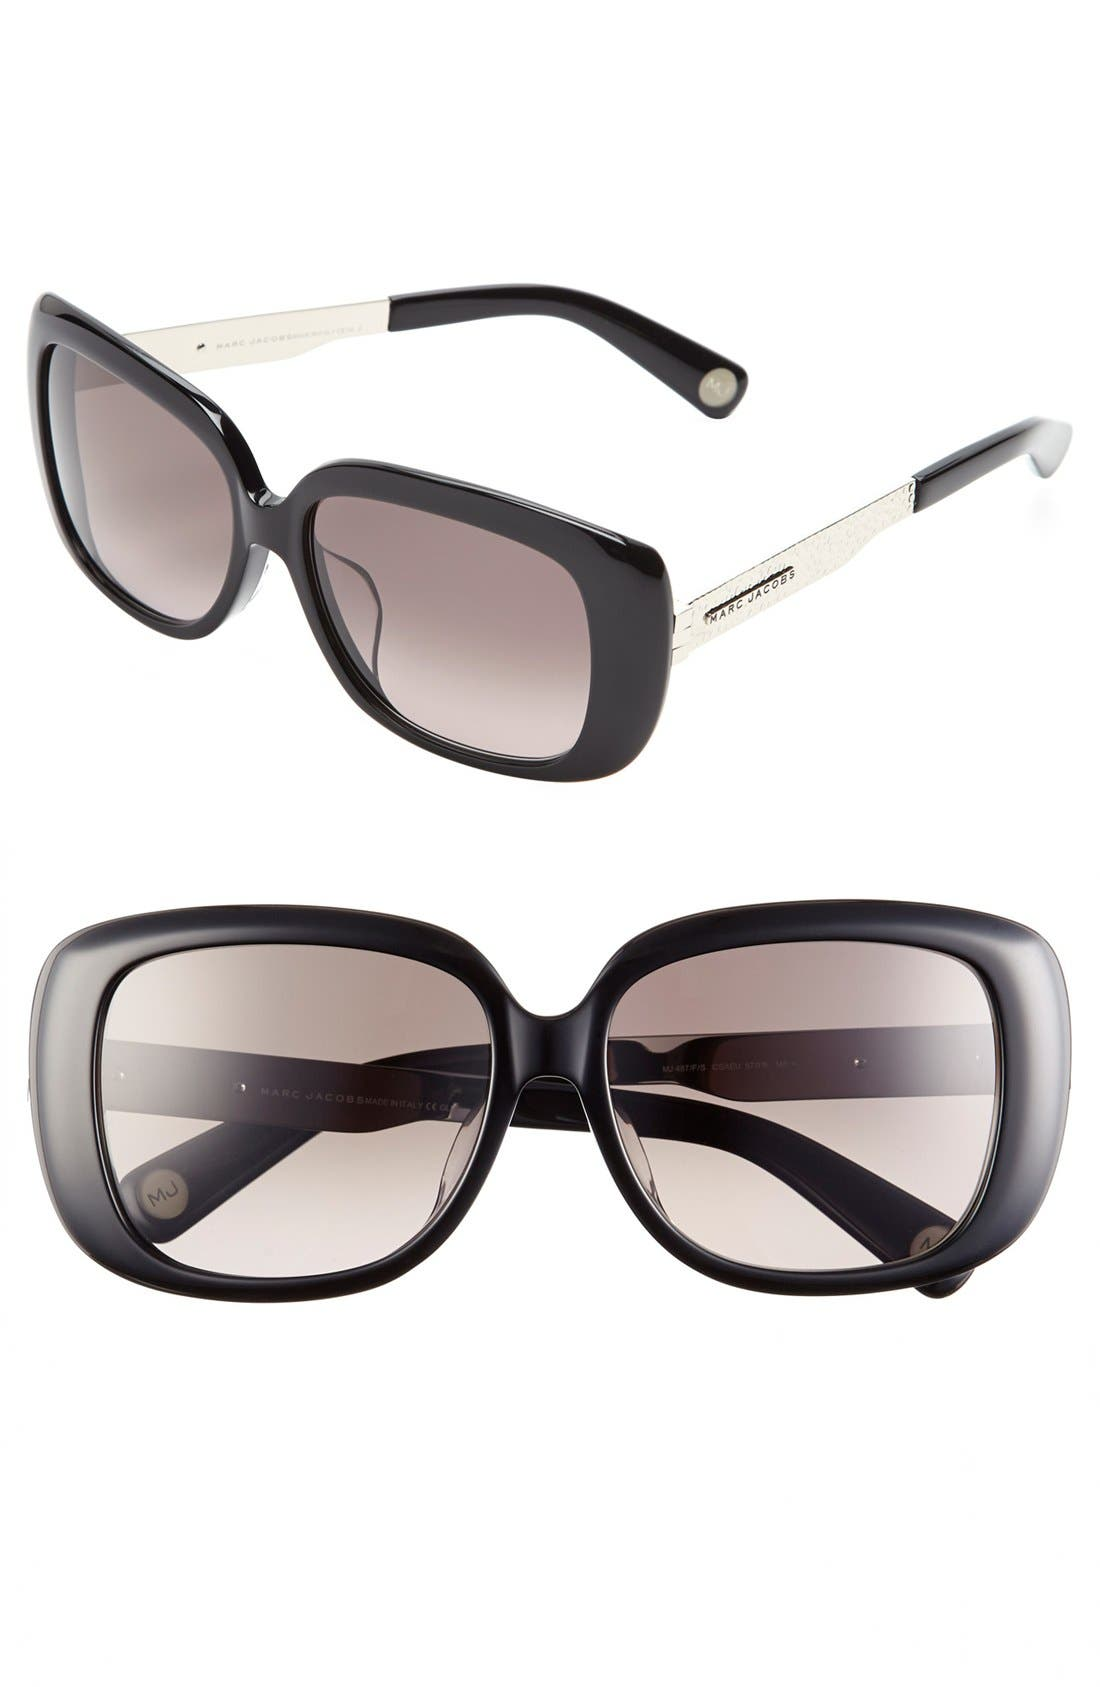 Main Image - MARC JACOBS 57mm Oversized Sunglasses